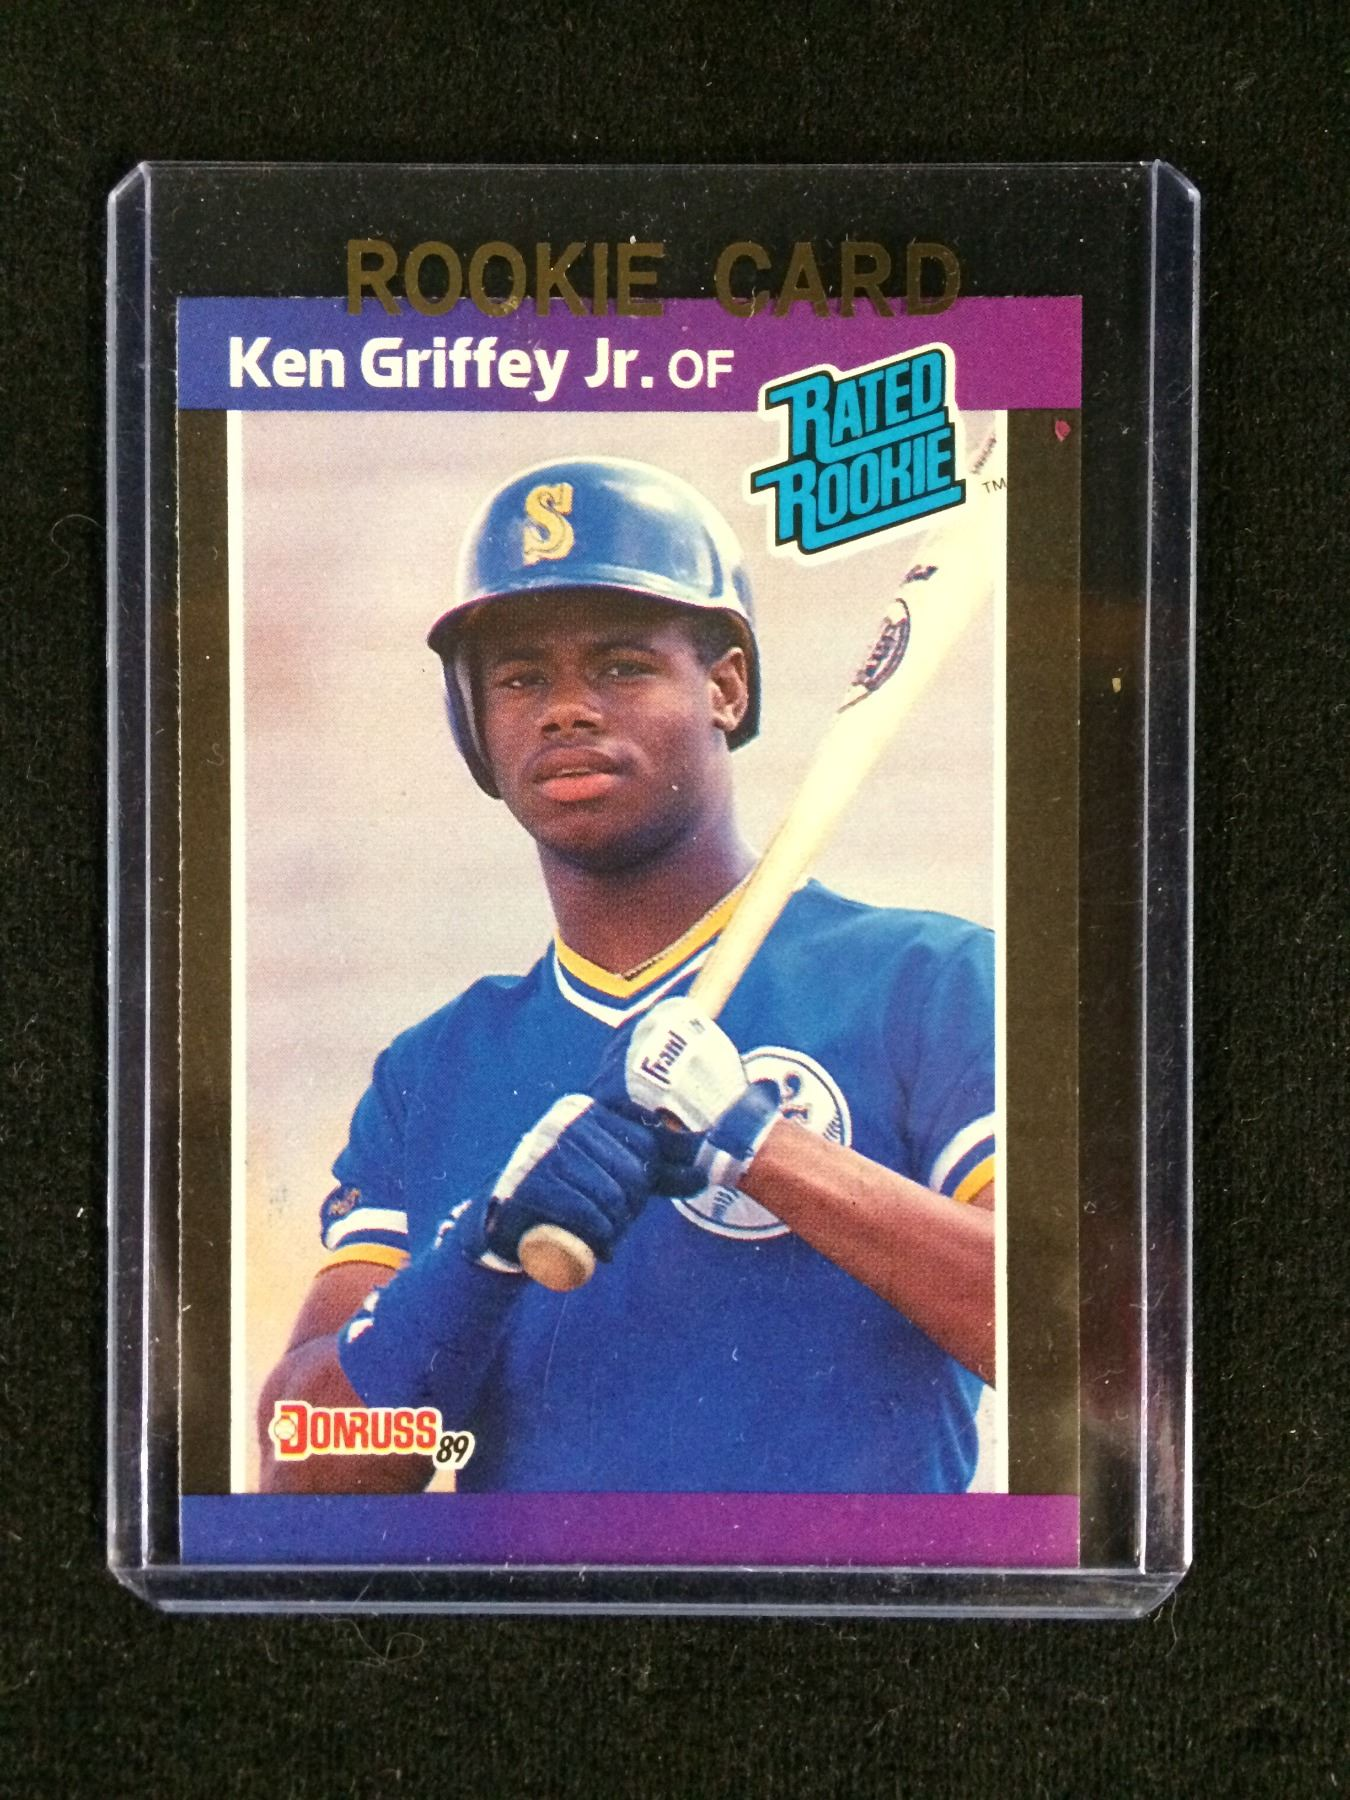 1989 Donruss Rated Rookie 33 Ken Griffey Jr Rookie Card